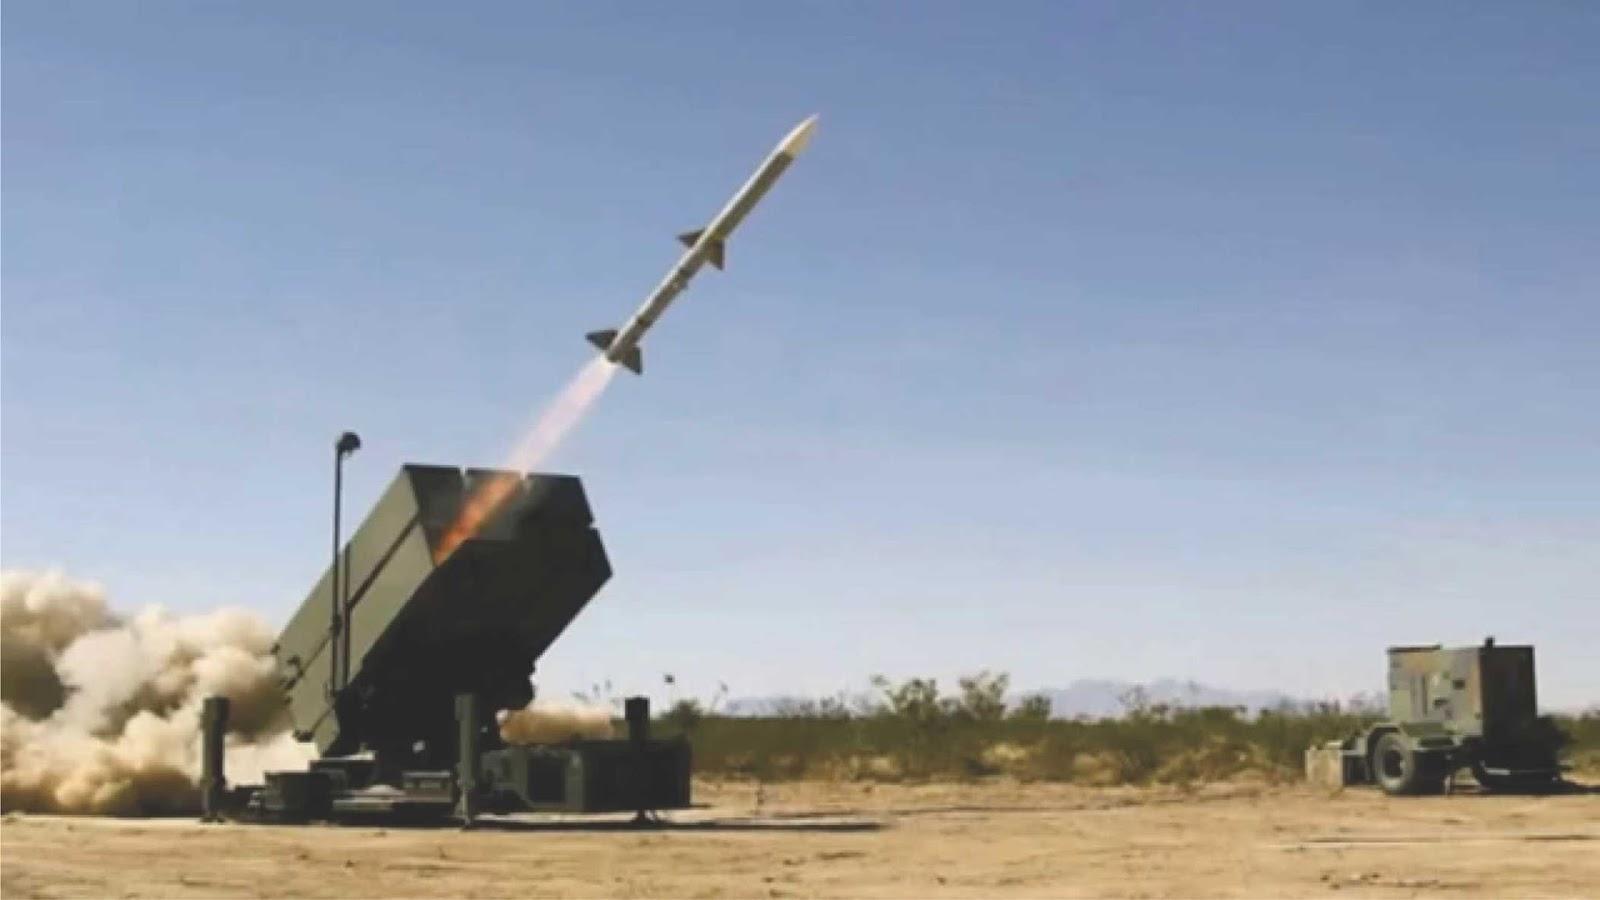 TNI AU Akan Memasang Rudal Jarak Menengah NASAMS di Teluk Naga